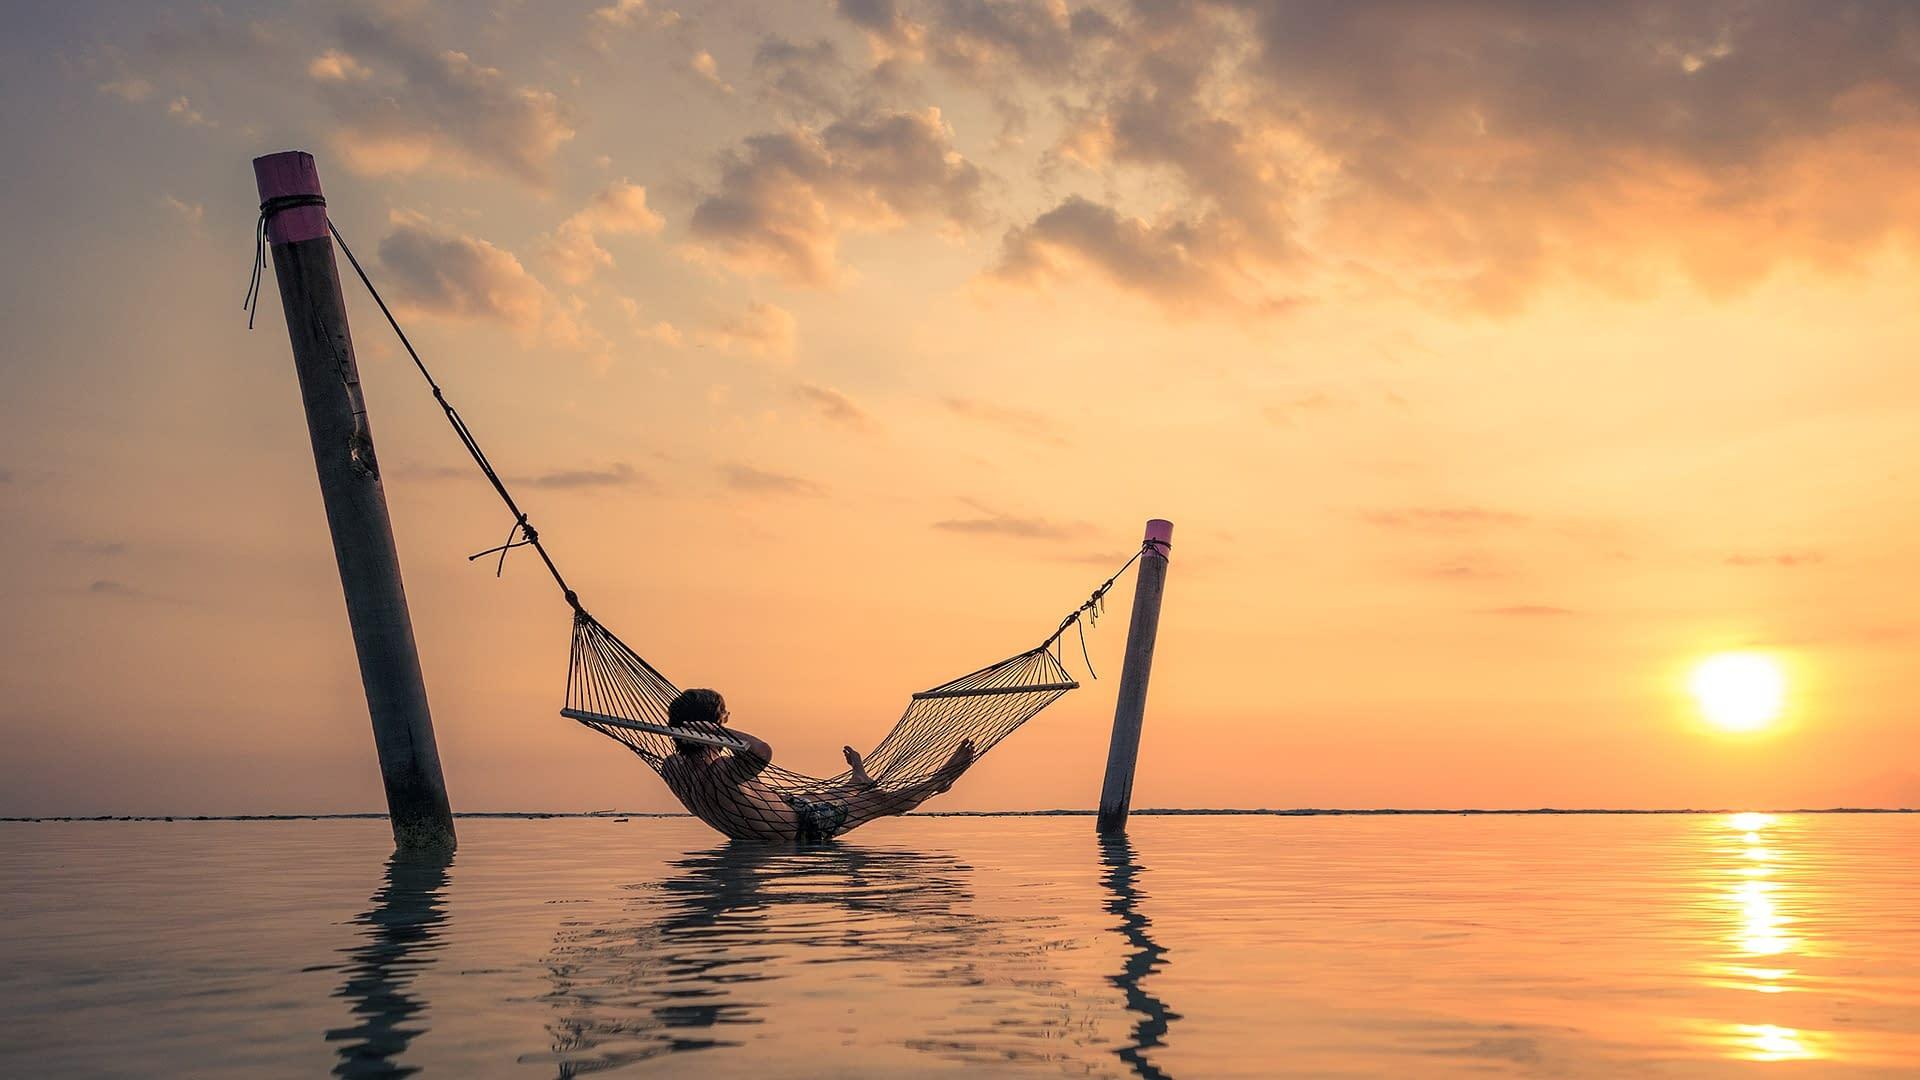 закат на море гамак Малайзия